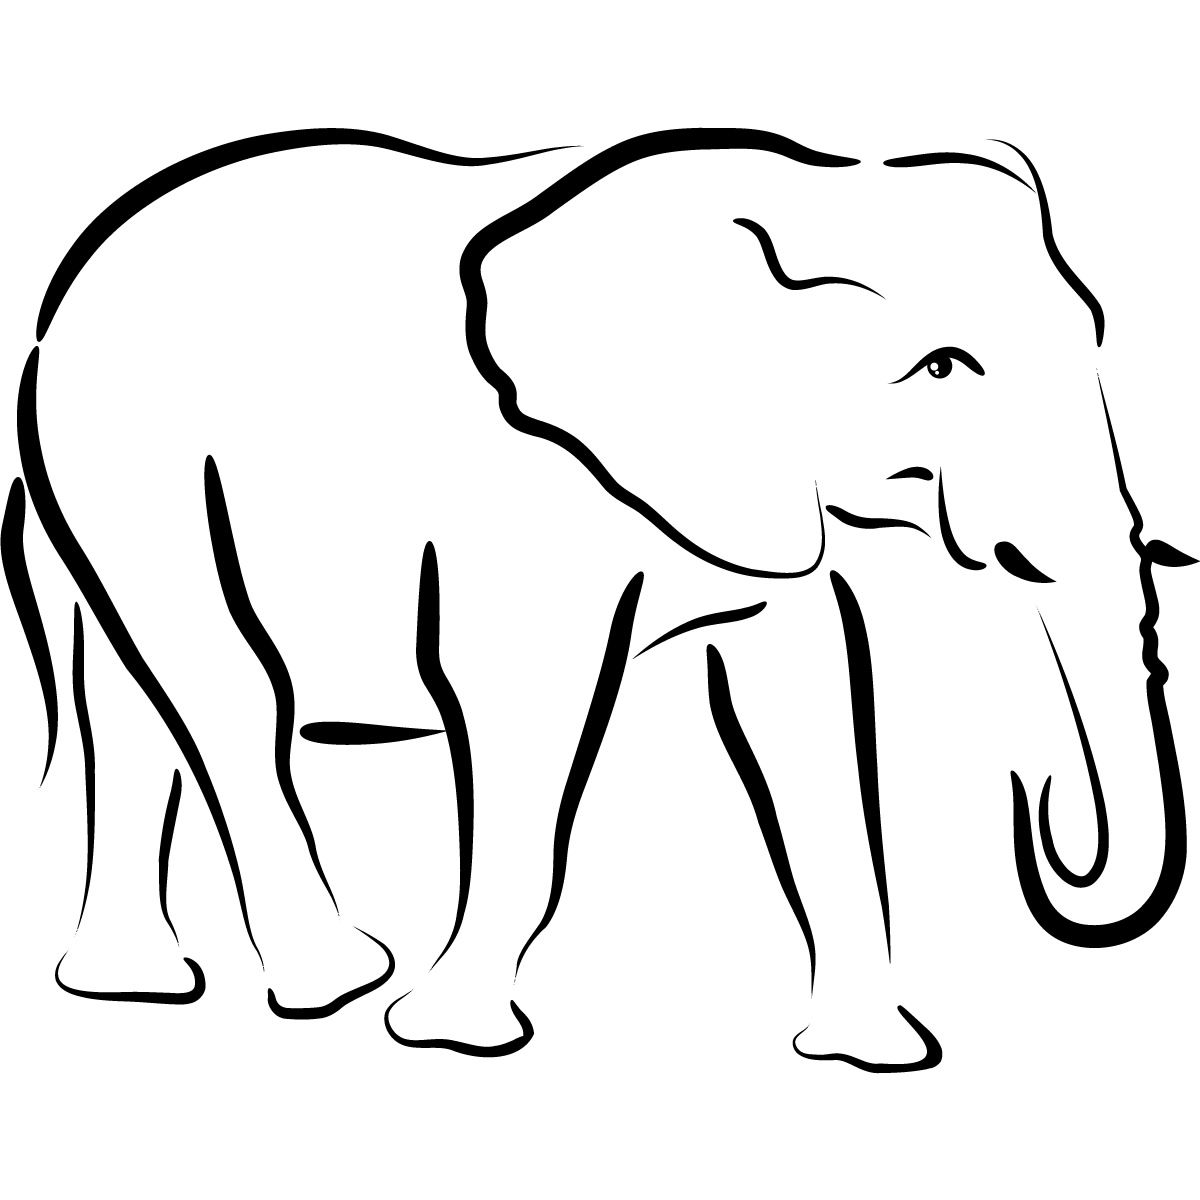 Elephant Line Drawing Tattoo : Images for gt elephant head profile outline elephants